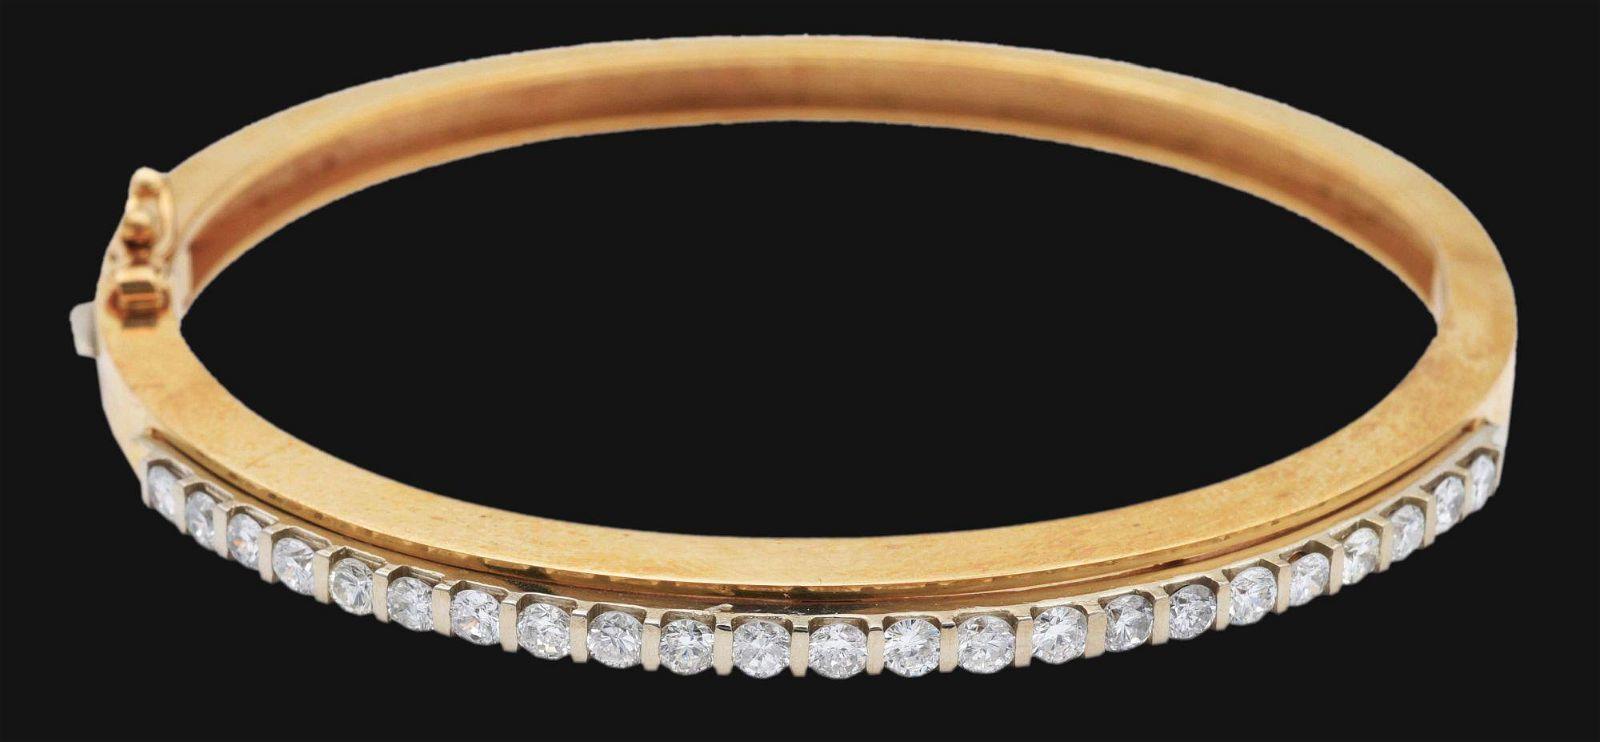 14K GOLD TWO TONE DIAMOND BANGLE BRACELET.